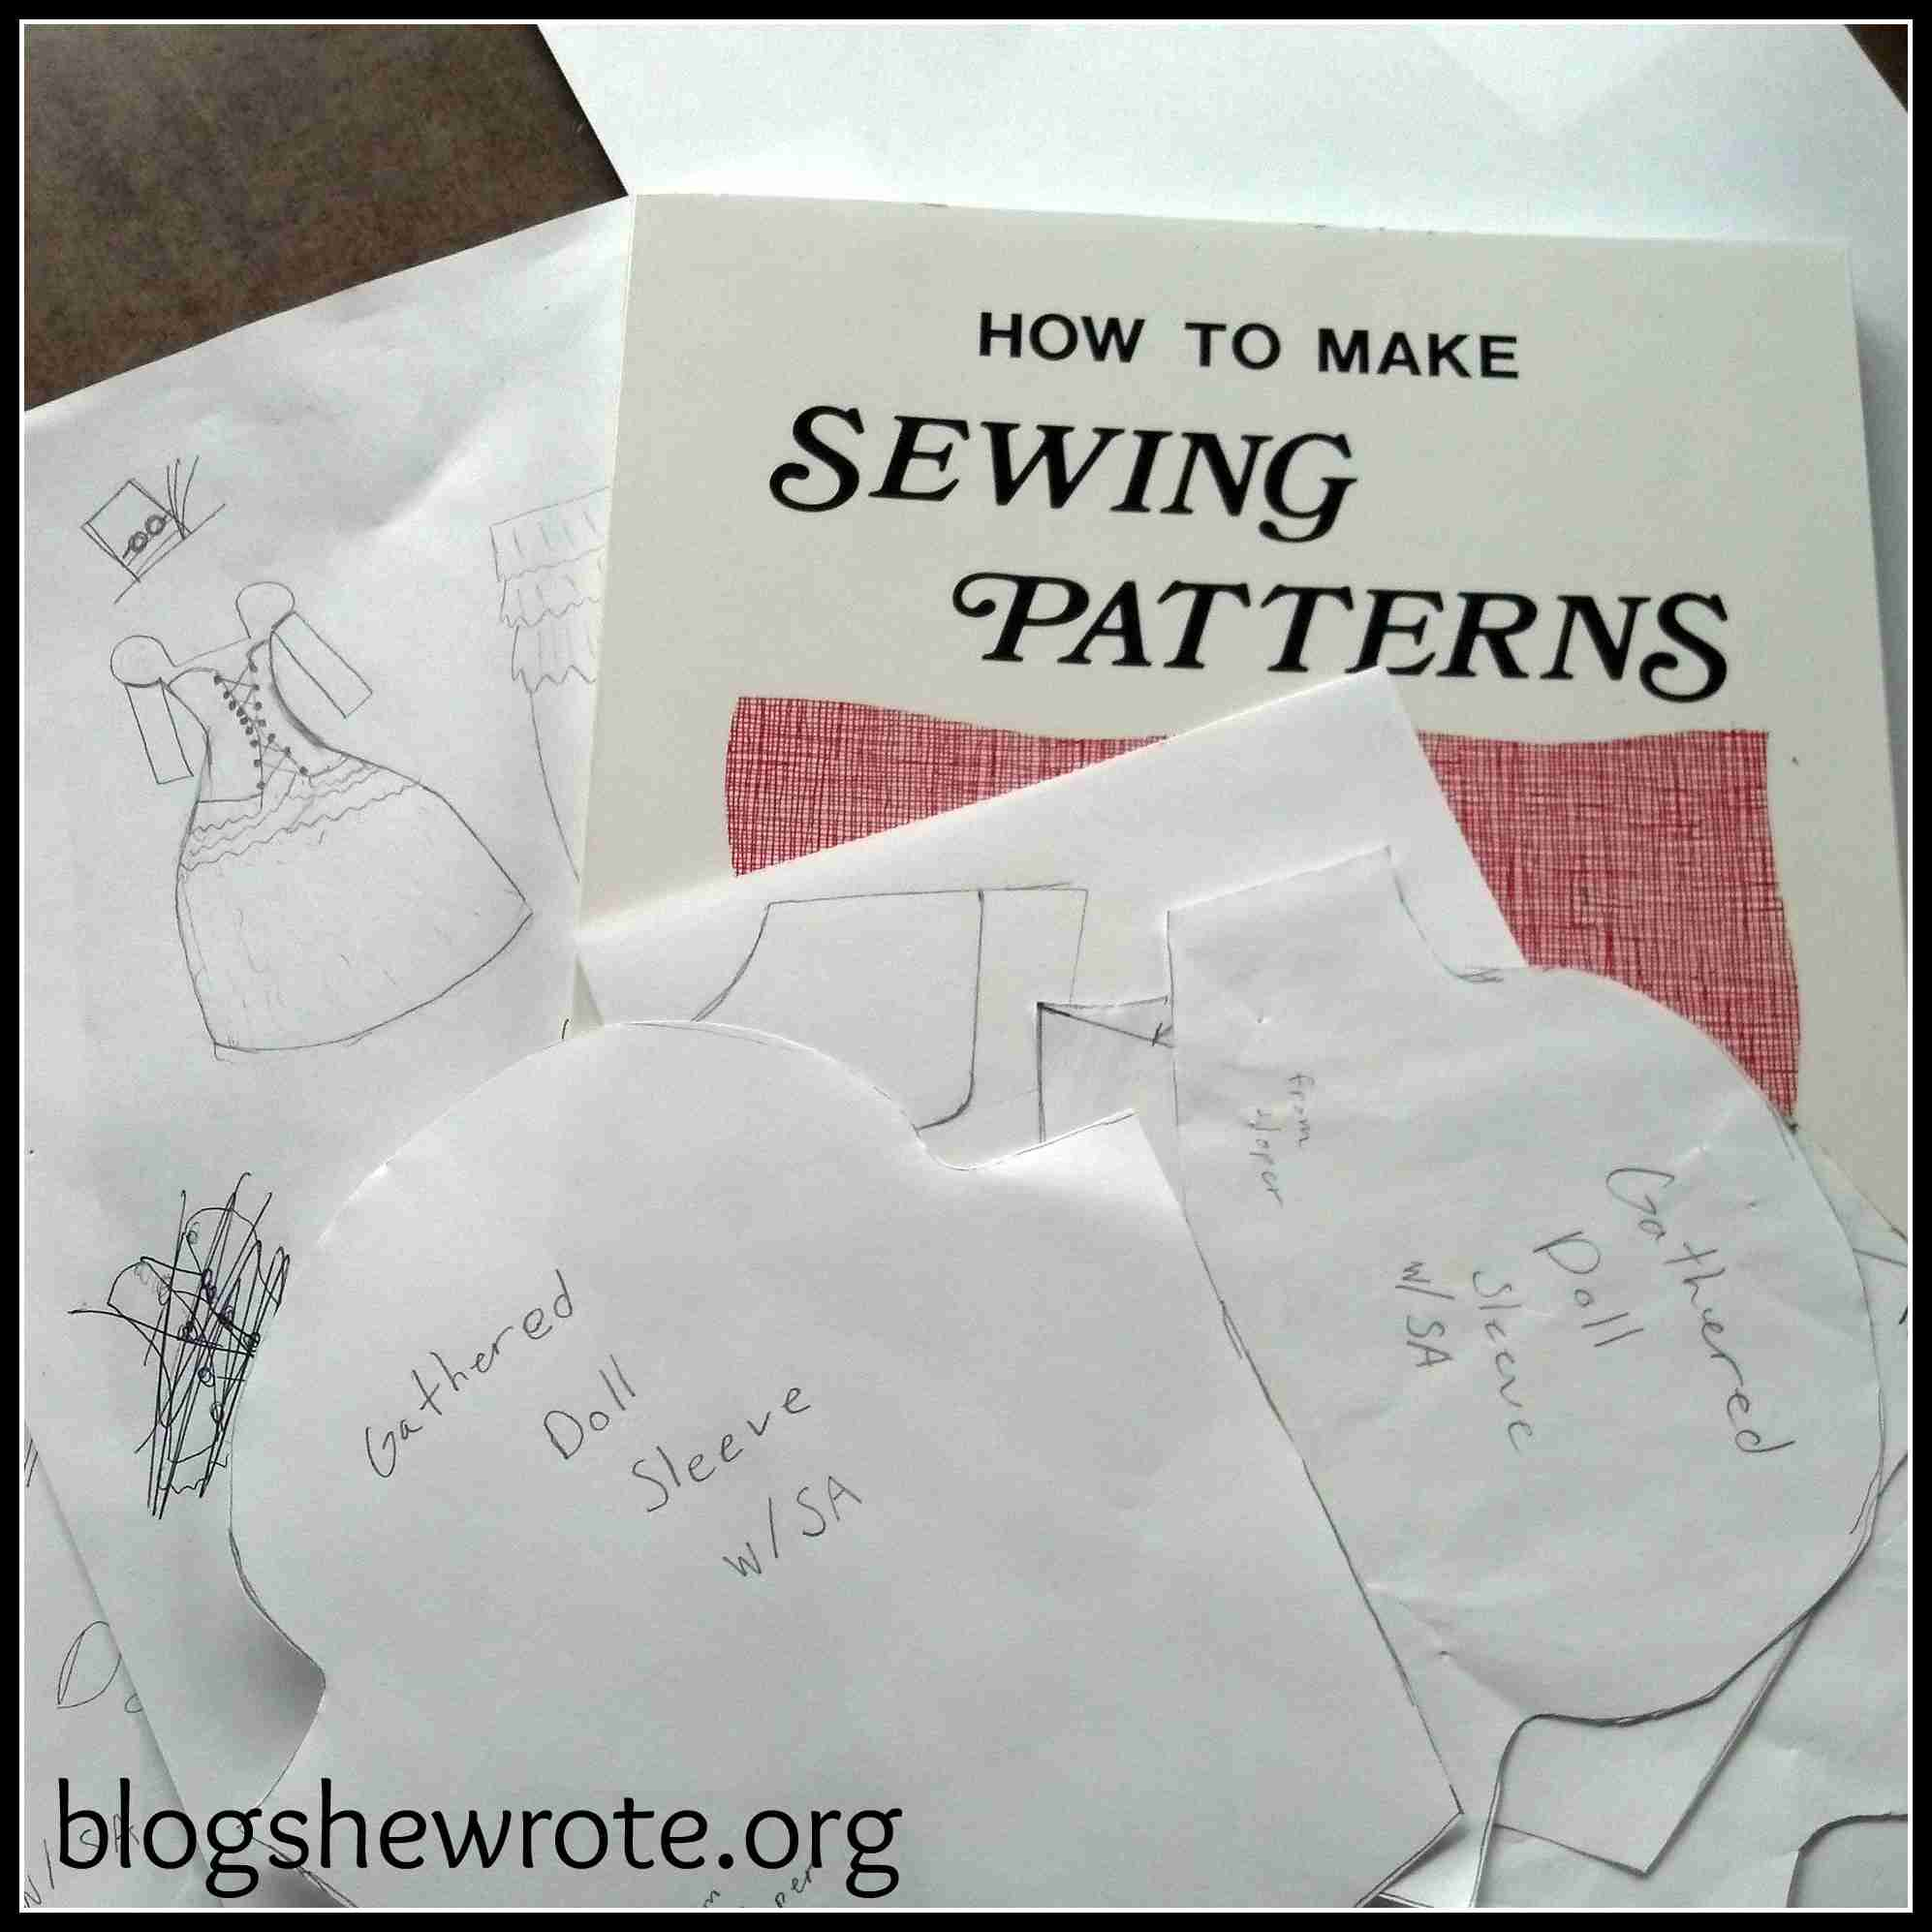 Blog, She Wrote: Steampunk Fashion Design & Drafting